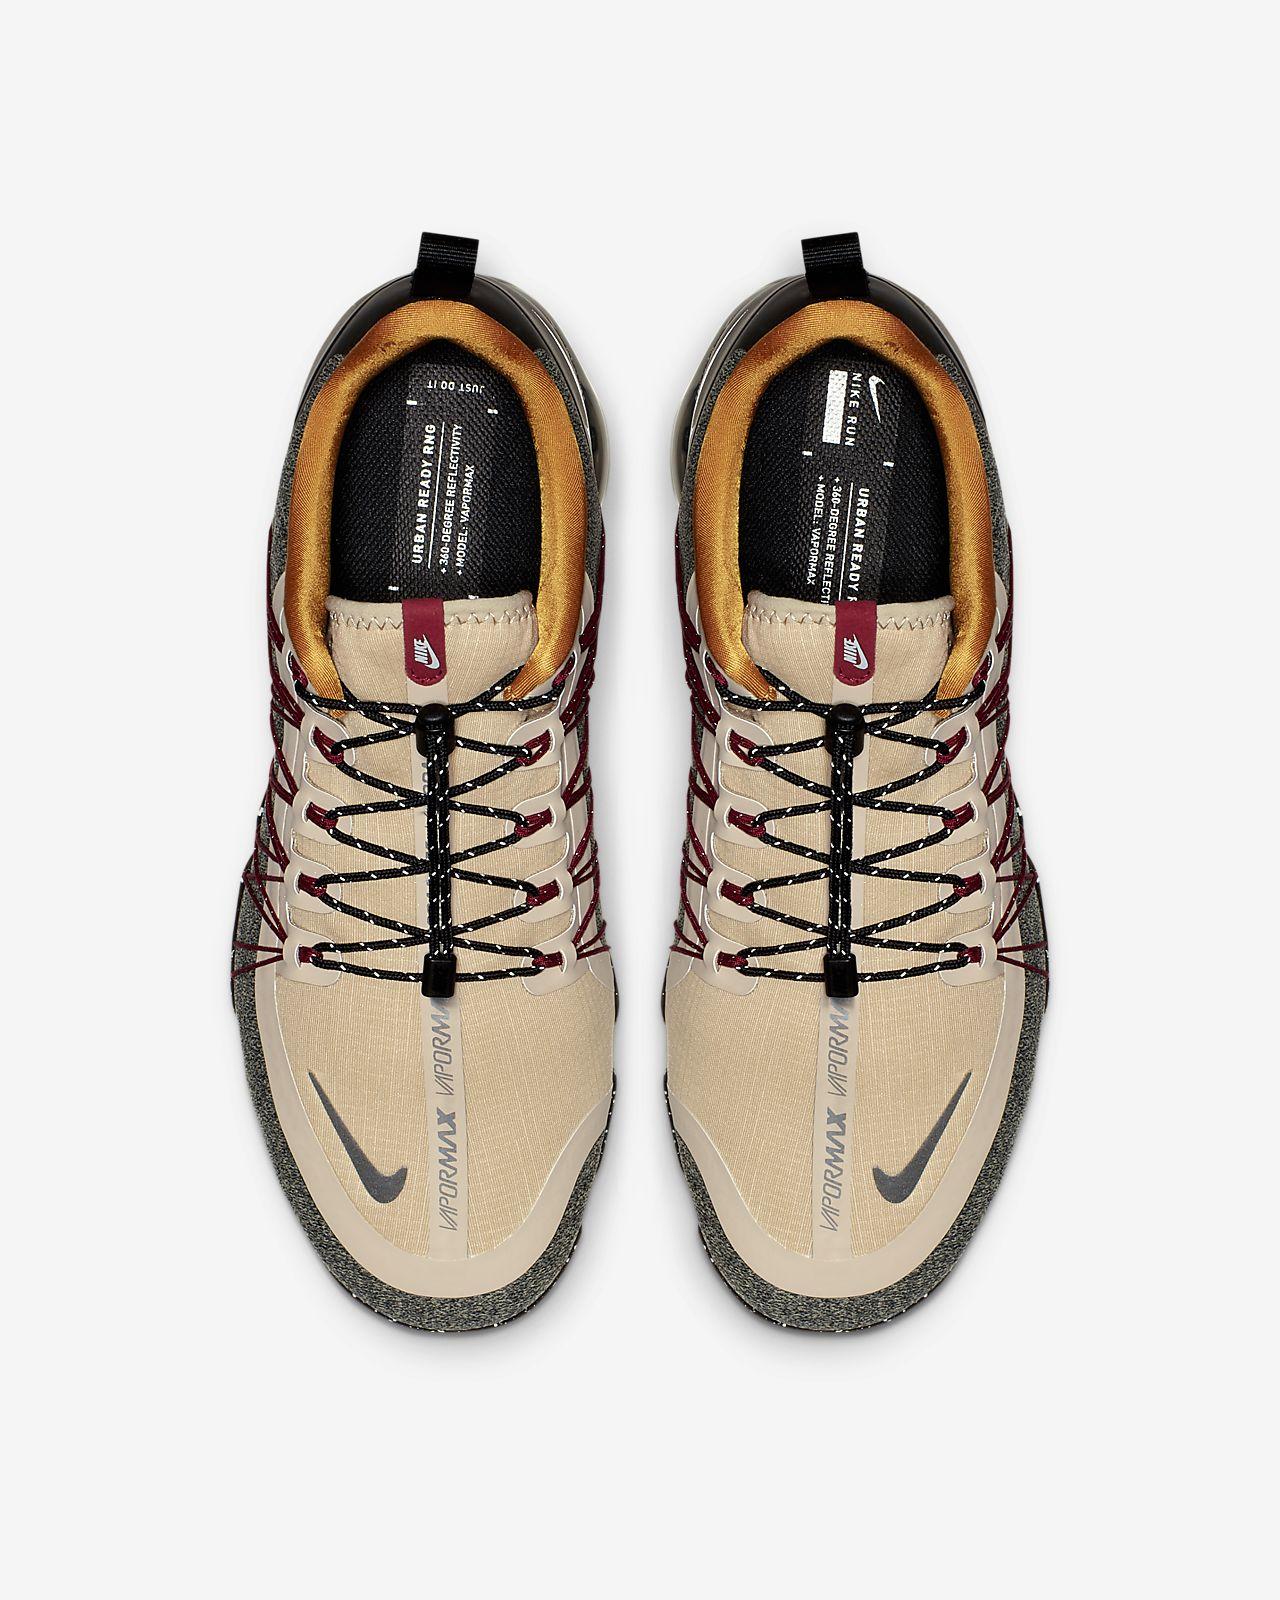 40959b71d9df5d Low Resolution Nike Air VaporMax Utility Men s Shoe Nike Air VaporMax  Utility Men s Shoe